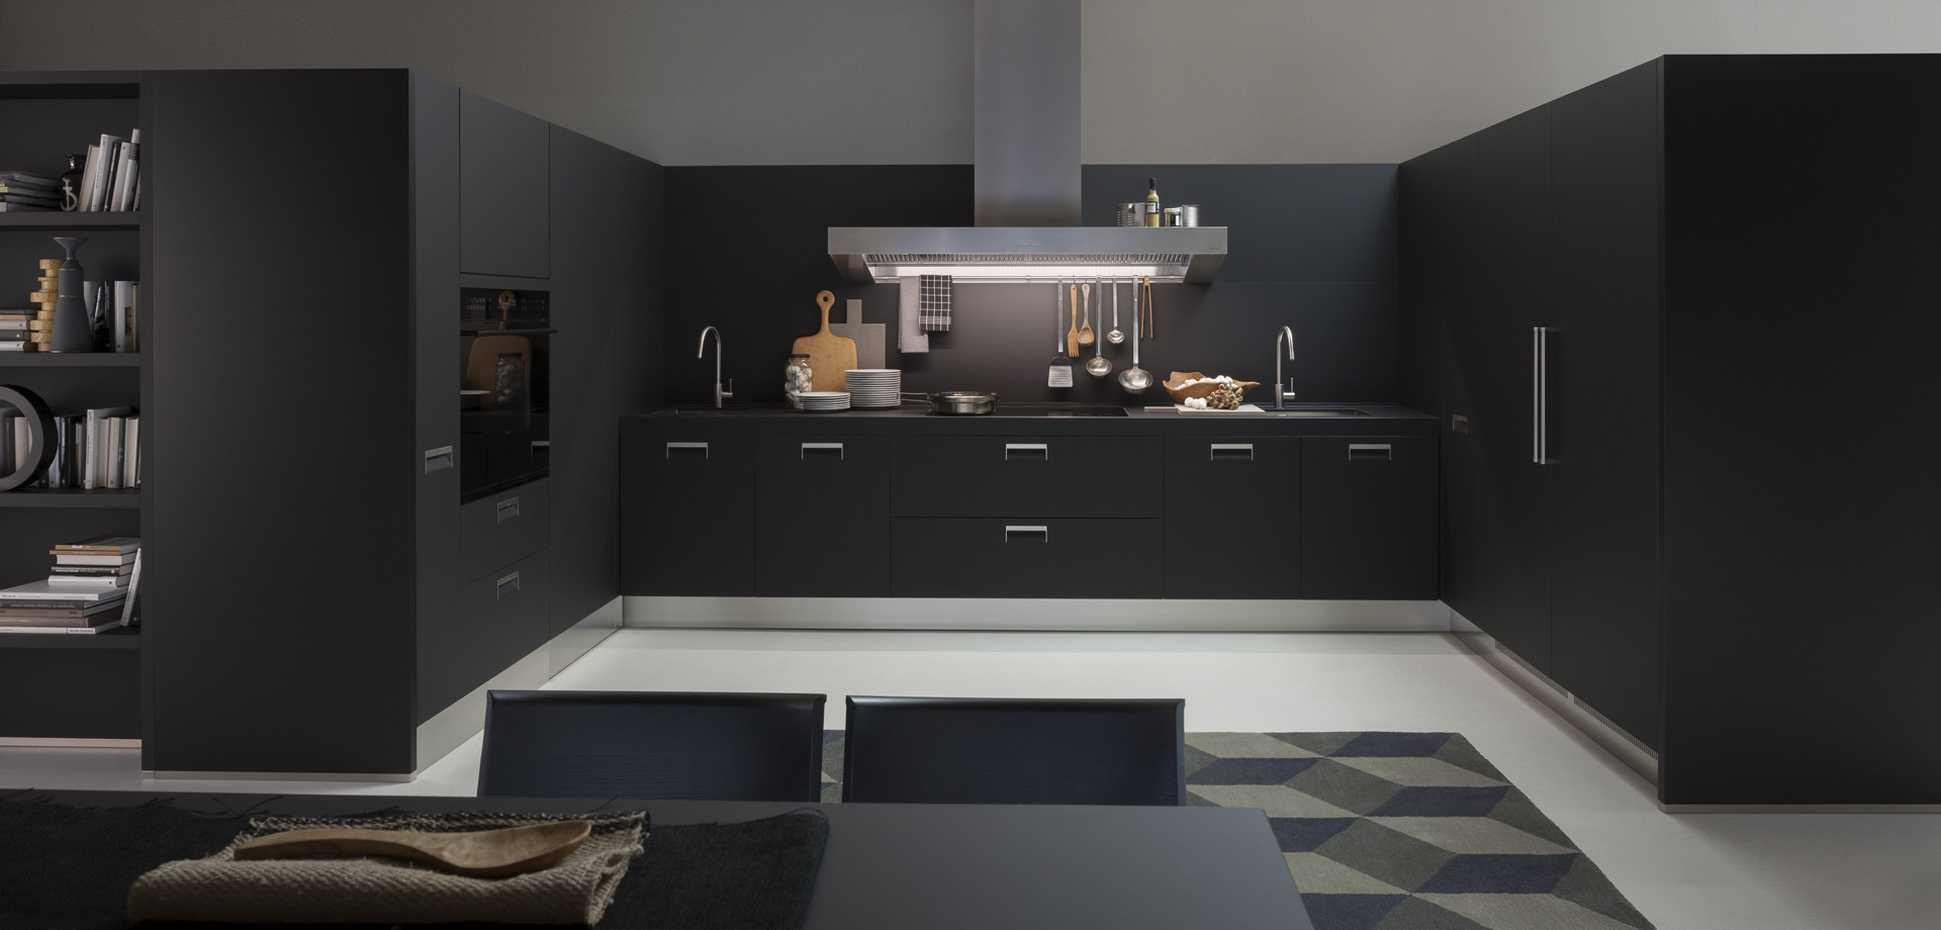 Italia by Arclinea product image 2